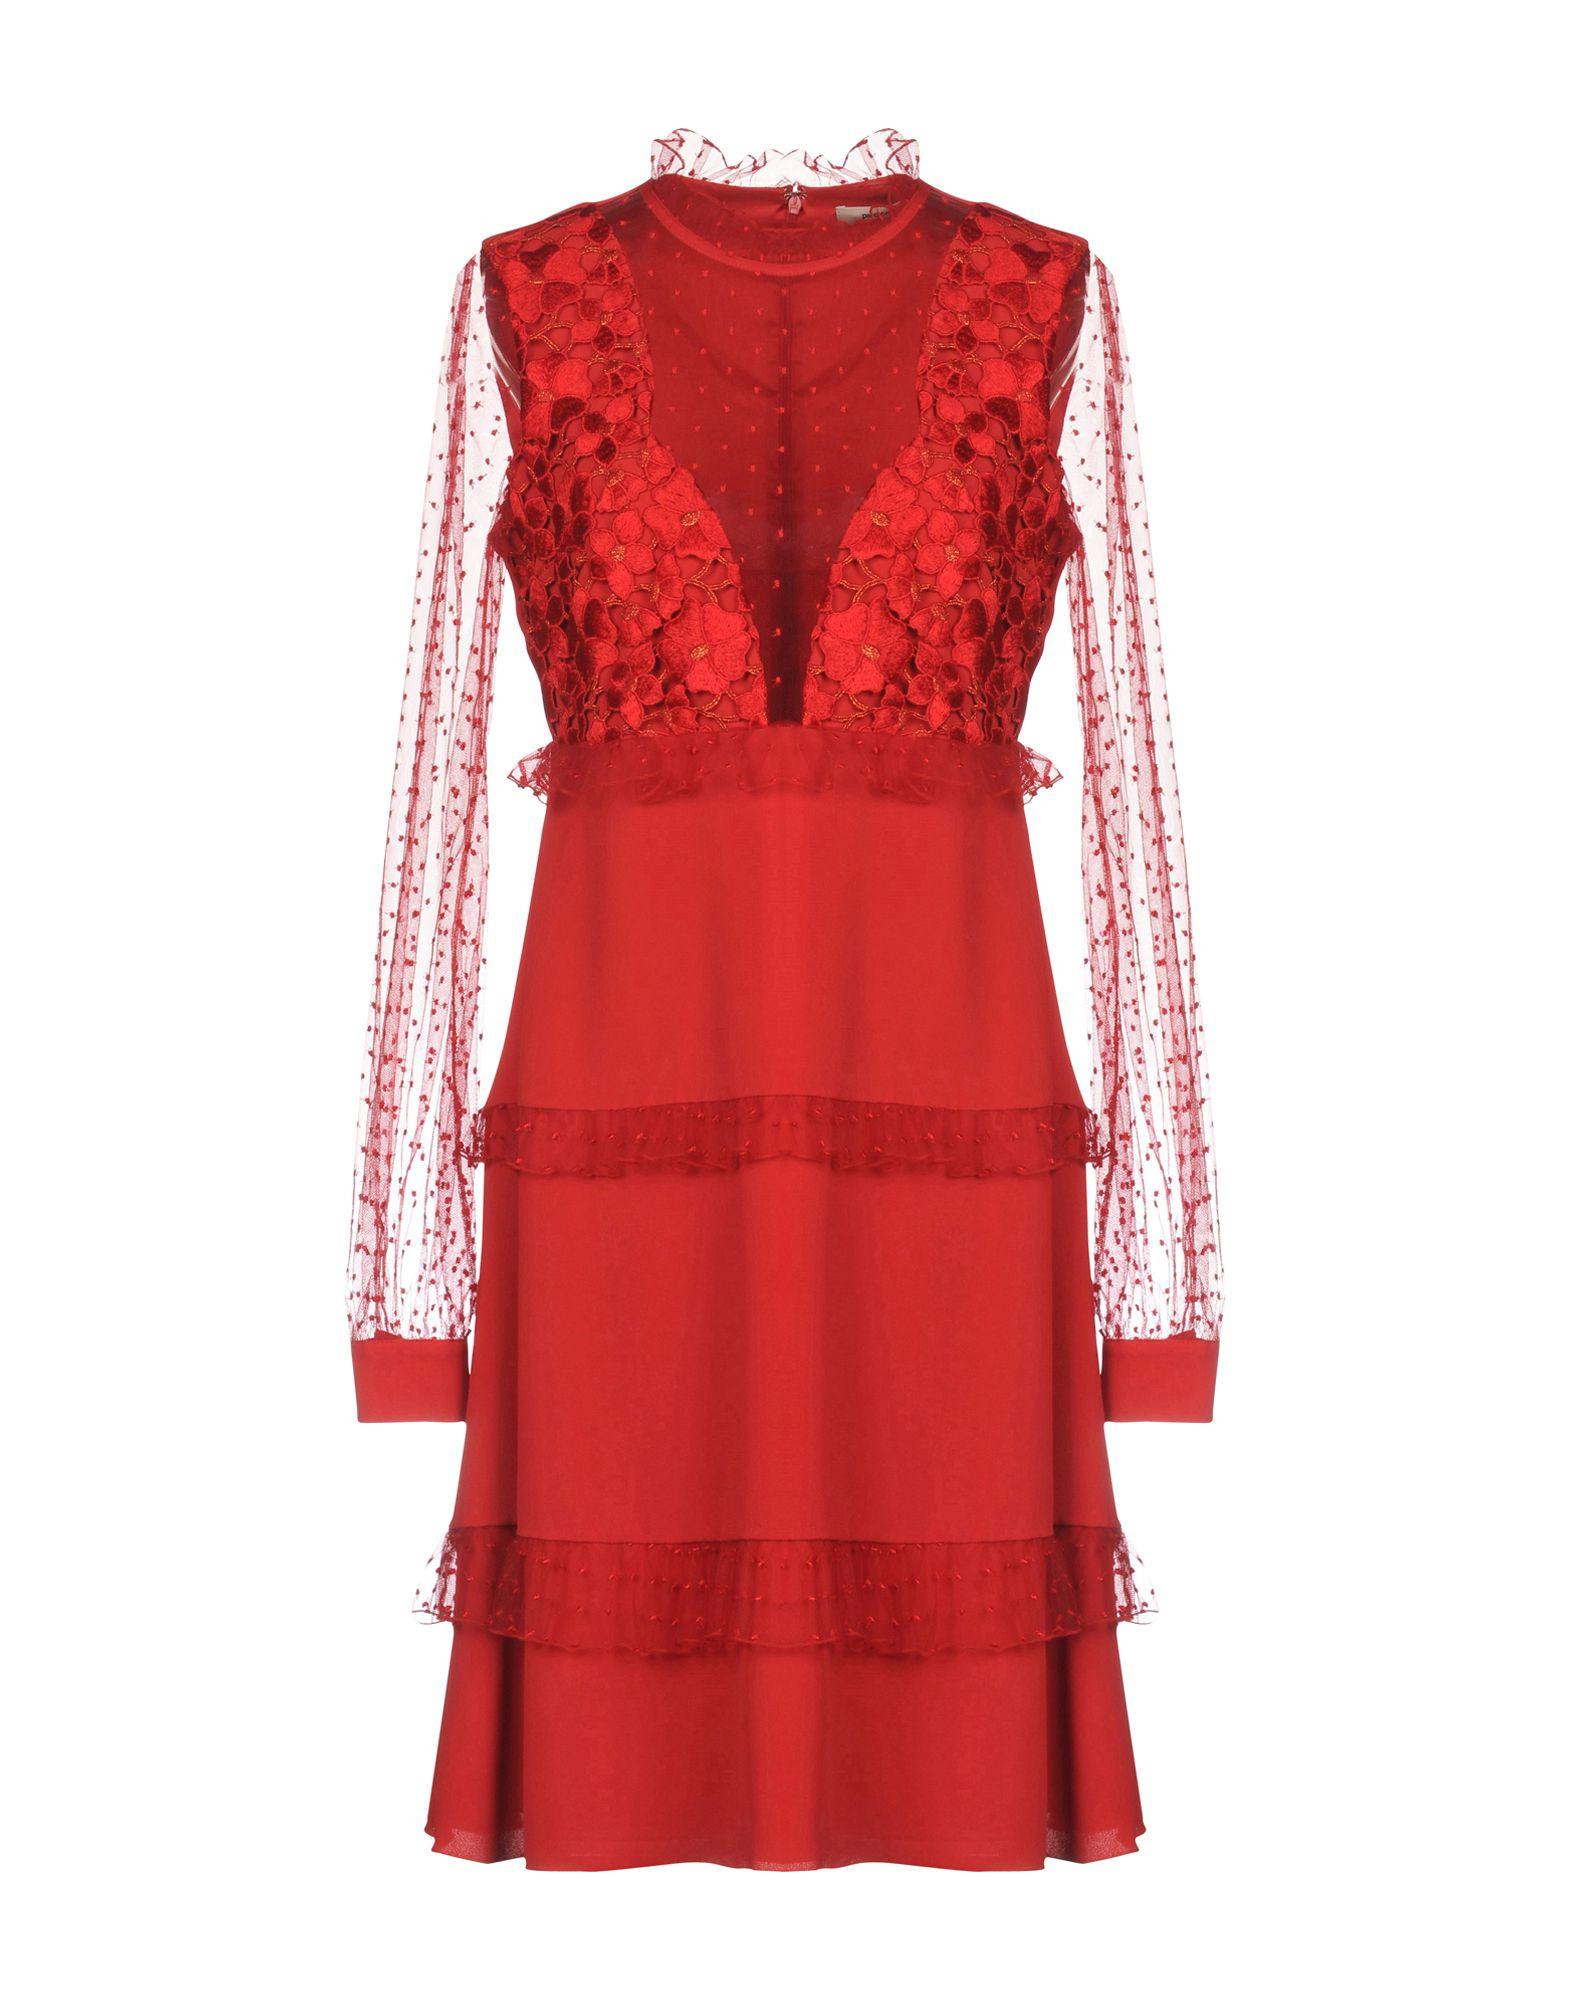 PICCIONE.PICCIONE | PICCIONE. PICCIONE Short dresses 34882086 | Goxip